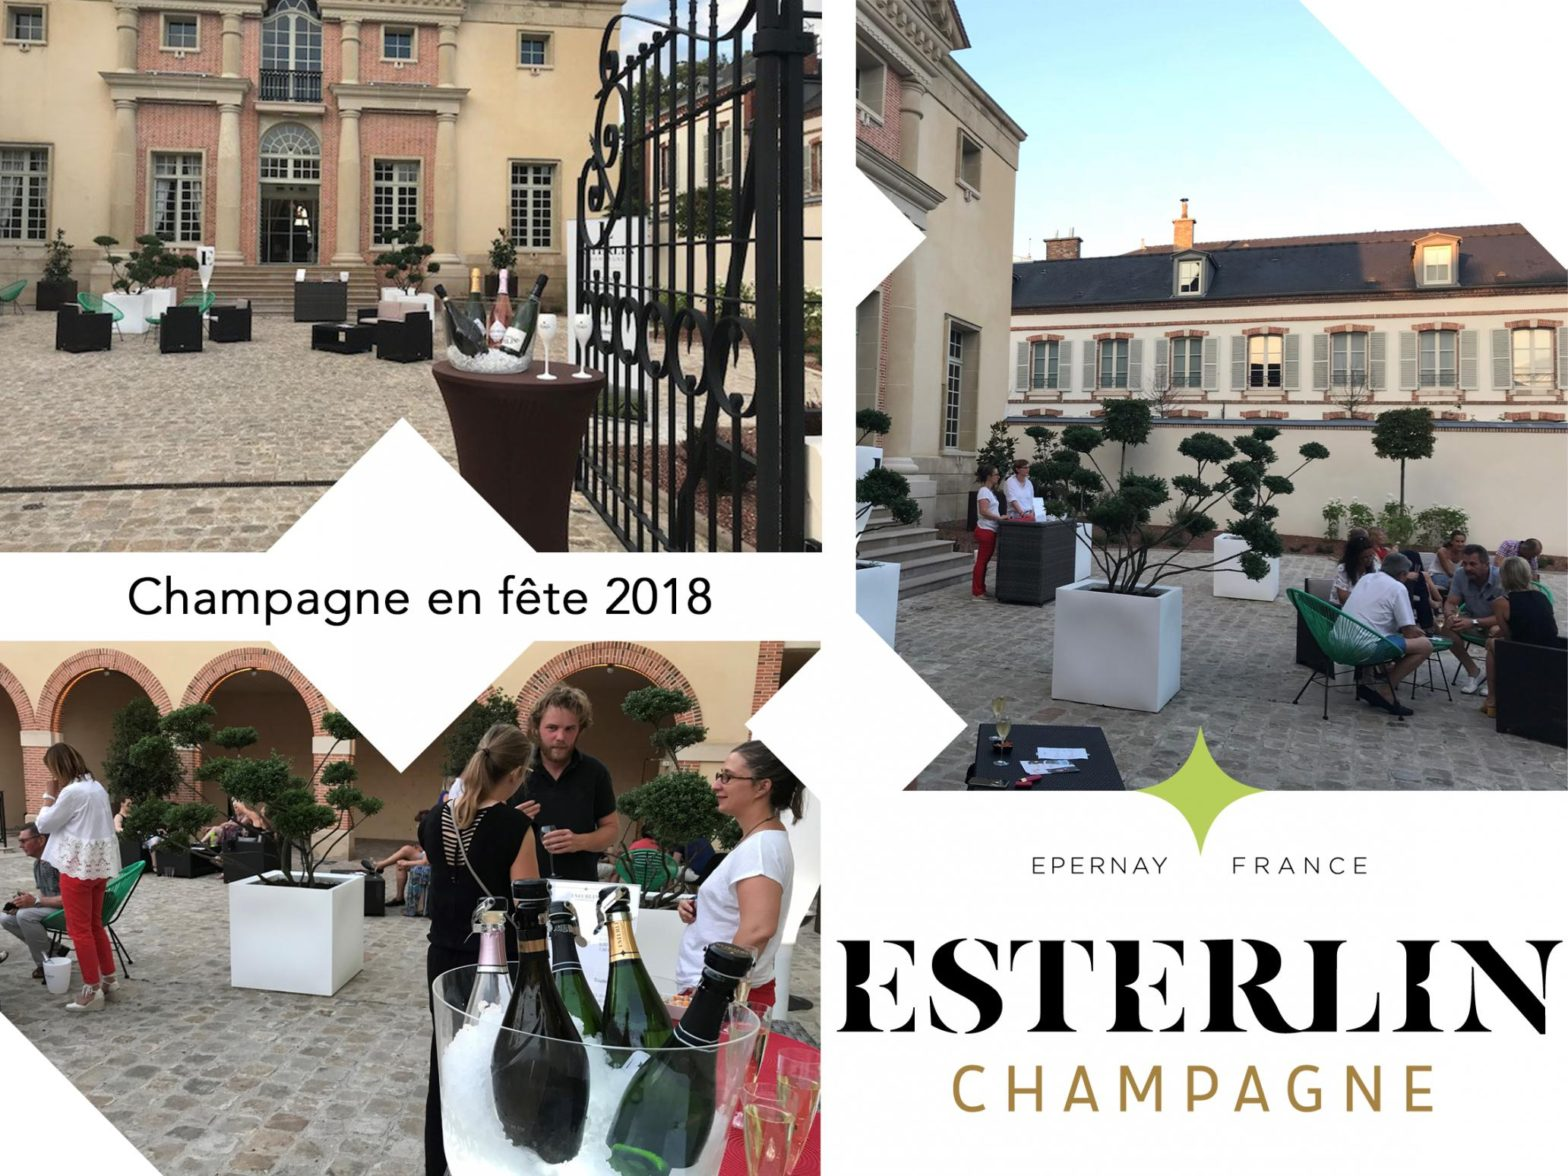 Article-Champagne-en-fête-2018